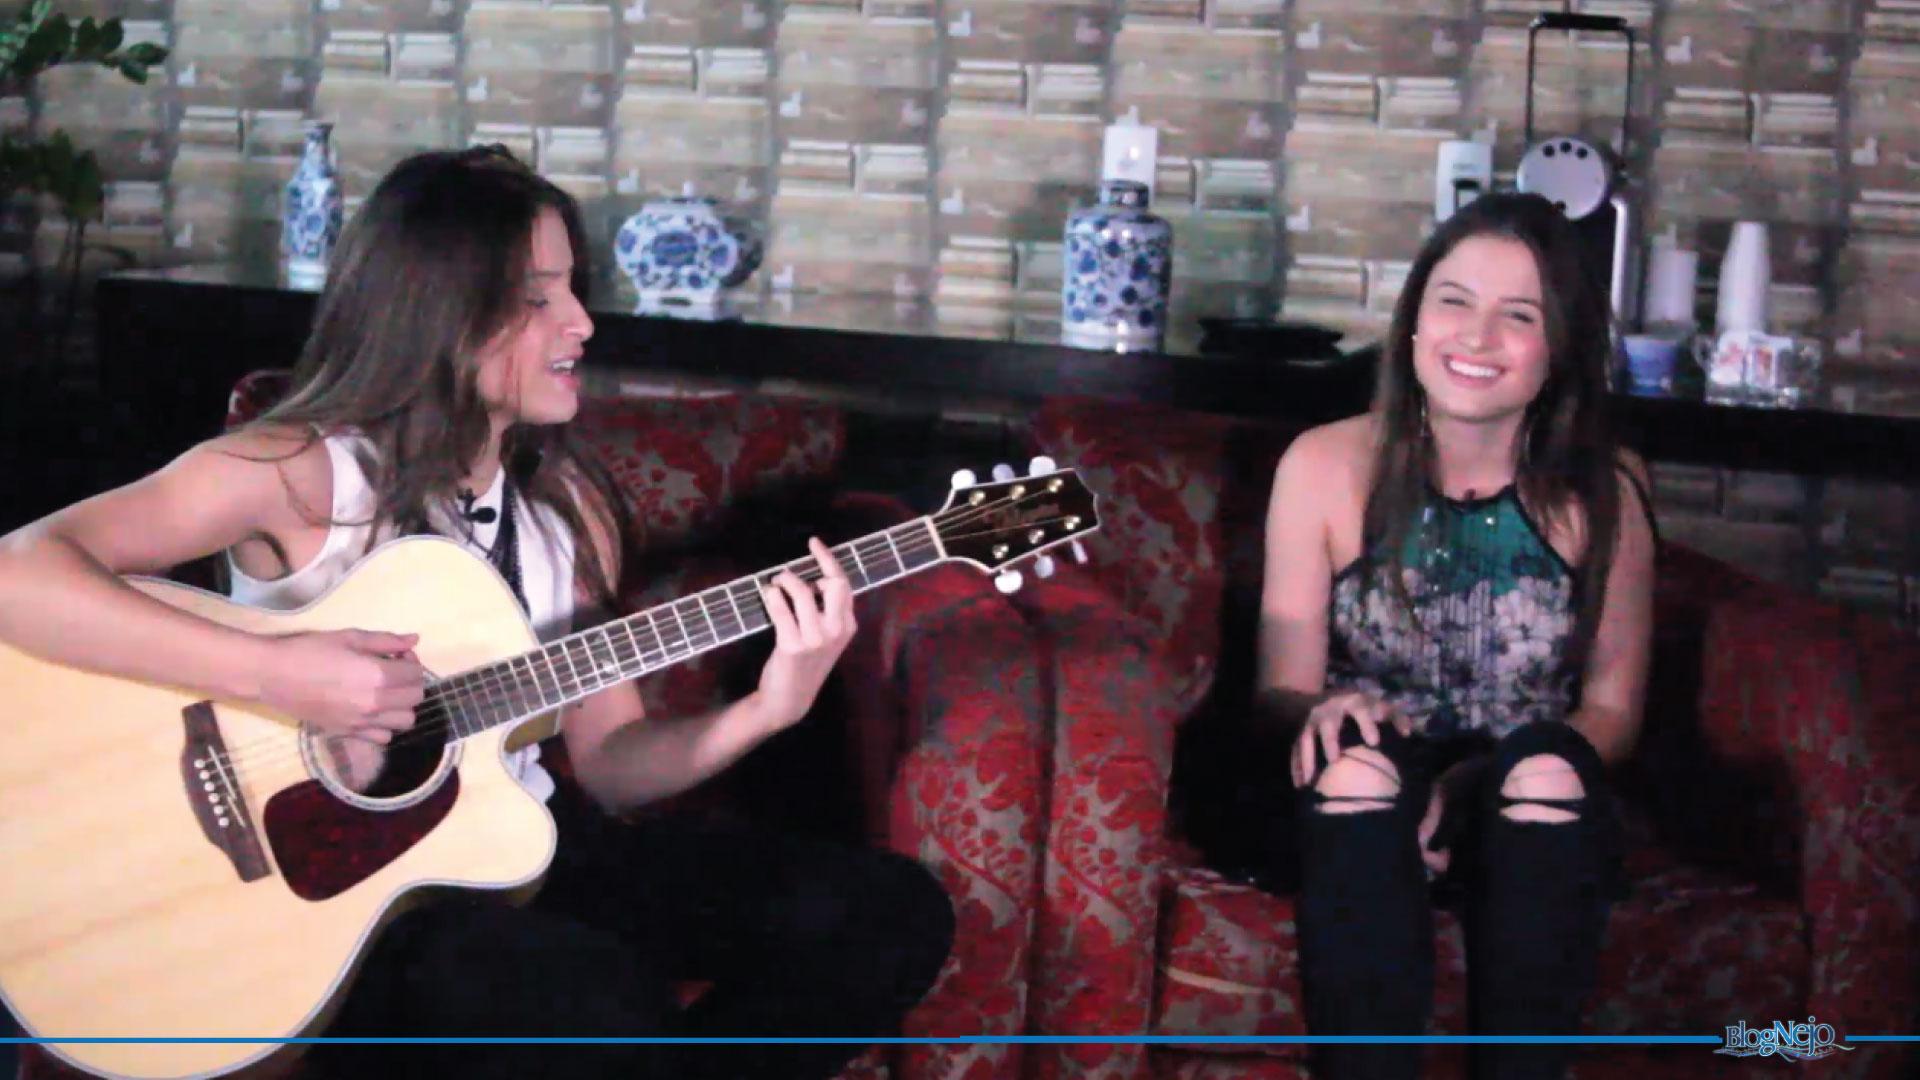 Entrevista Exclusiva – Júlia & Rafaela